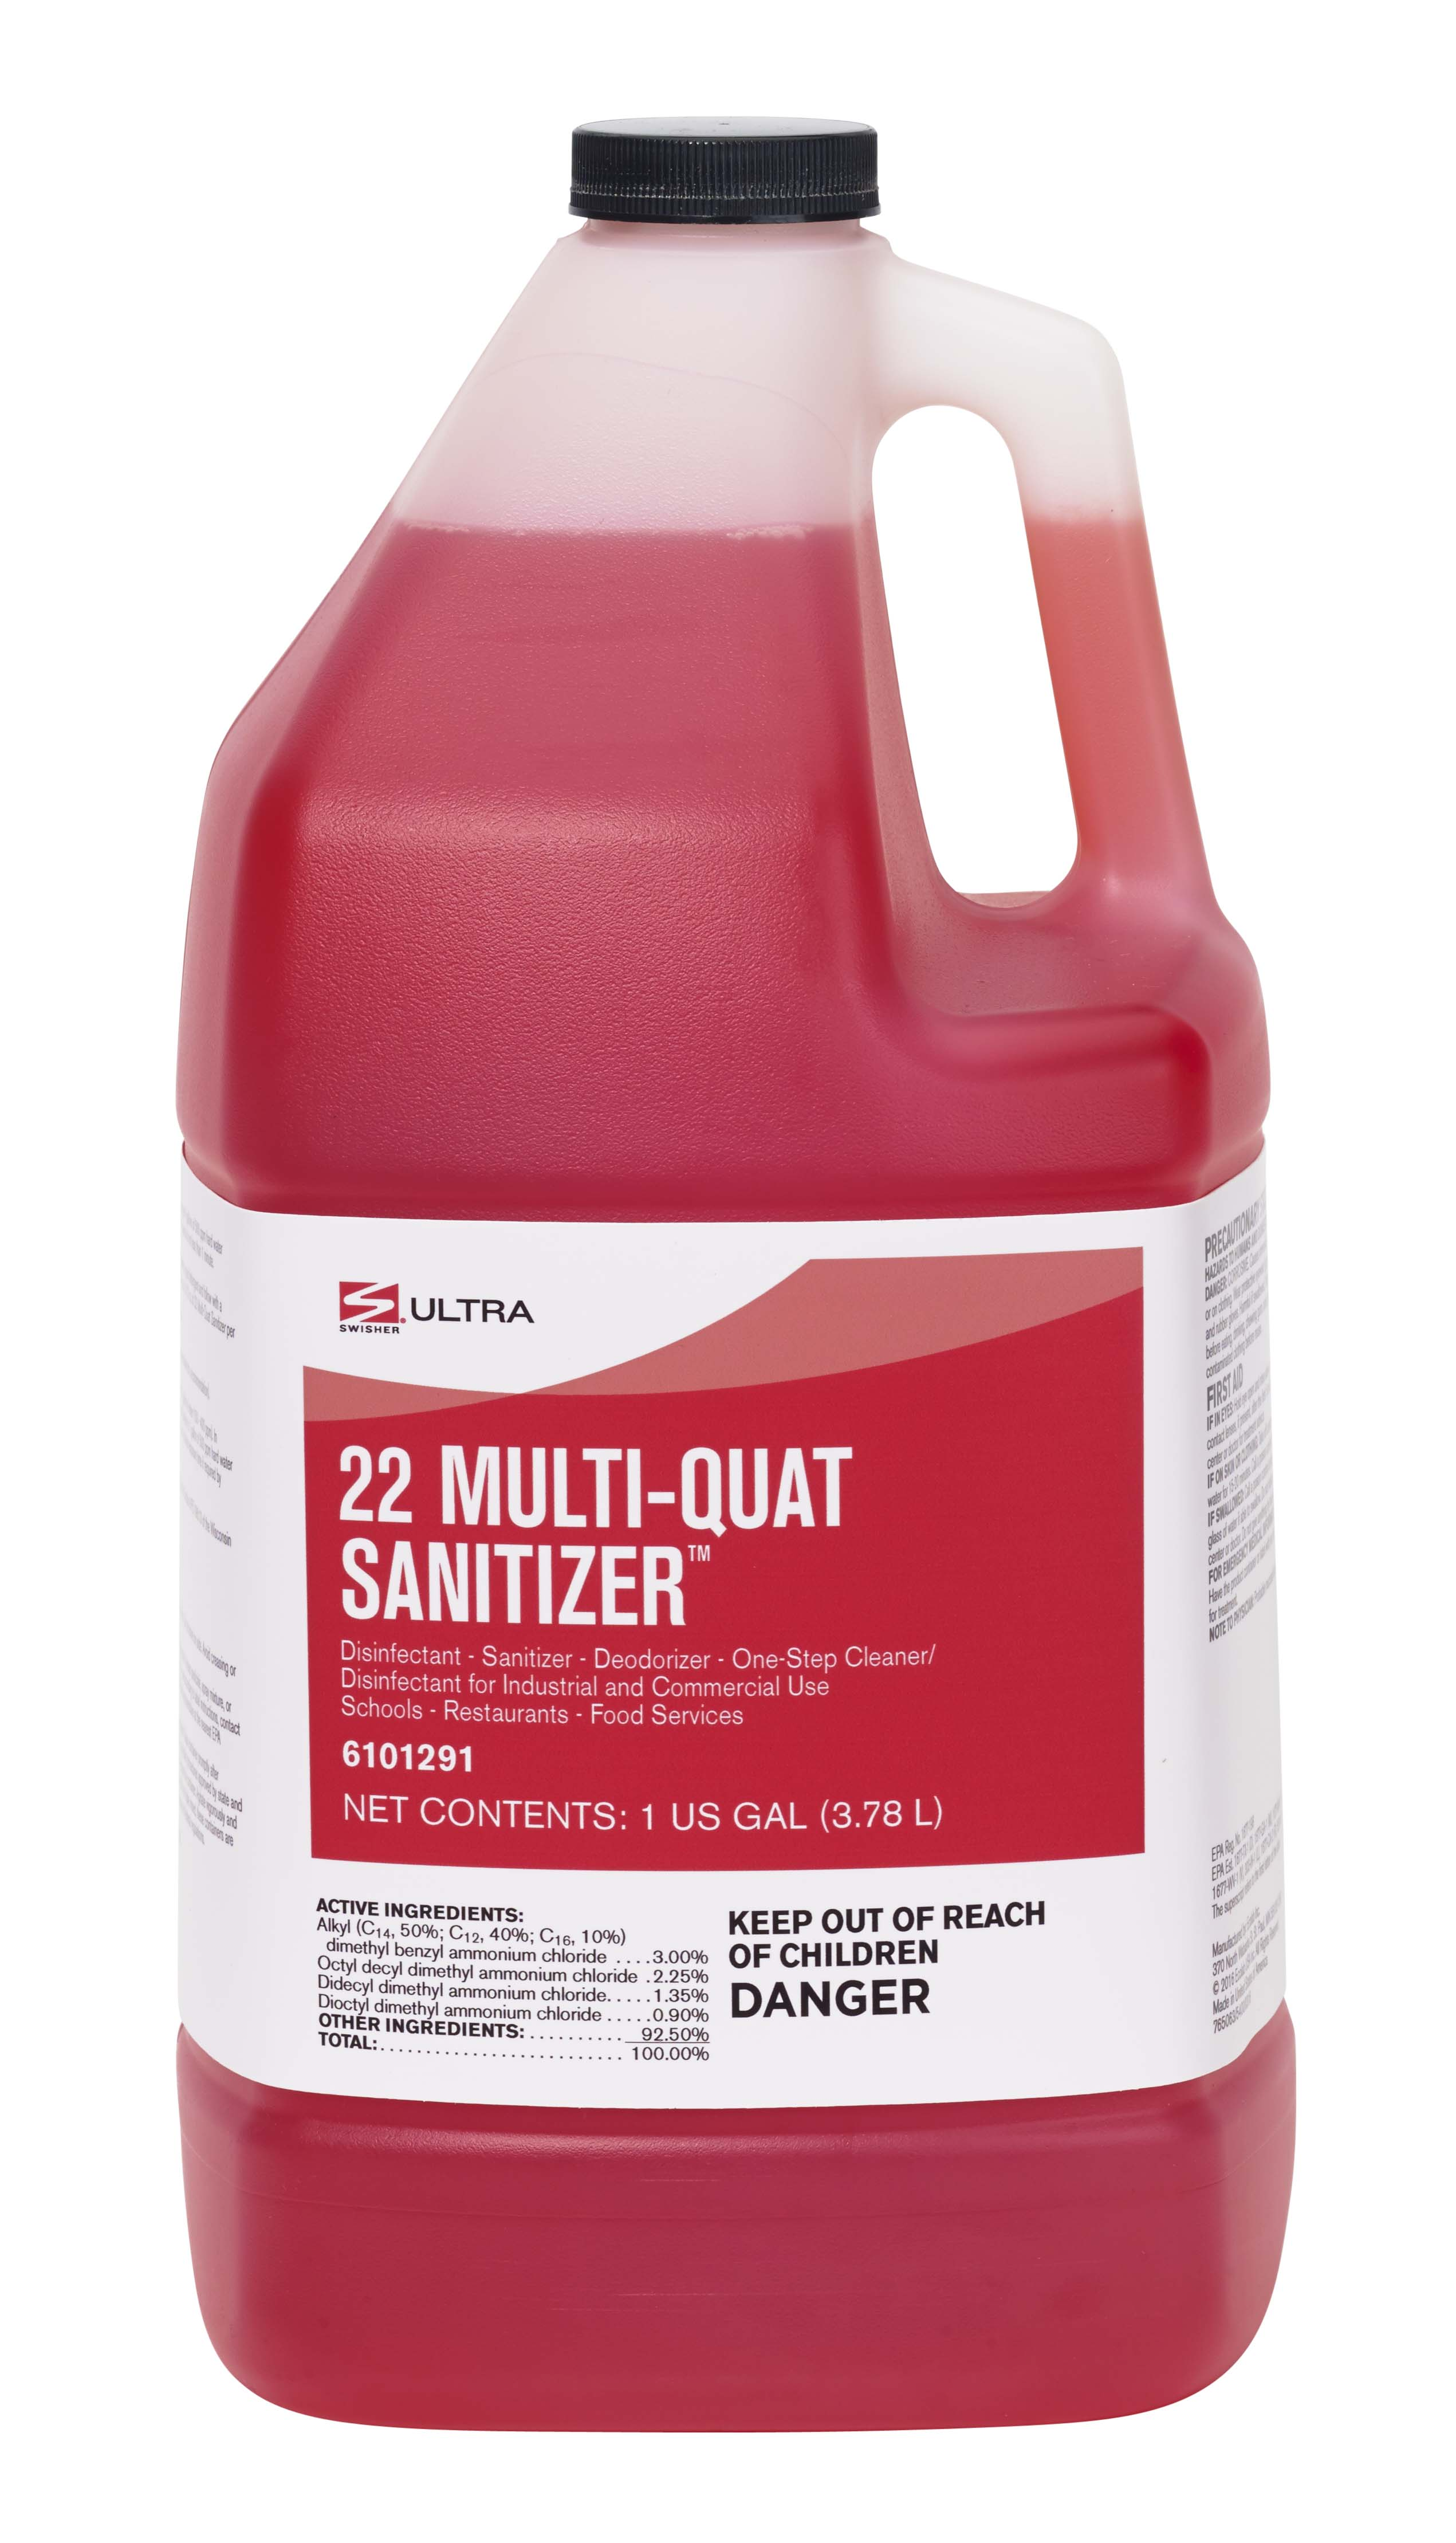 Swisher 22 Multi Quat Sanitizer Ultra